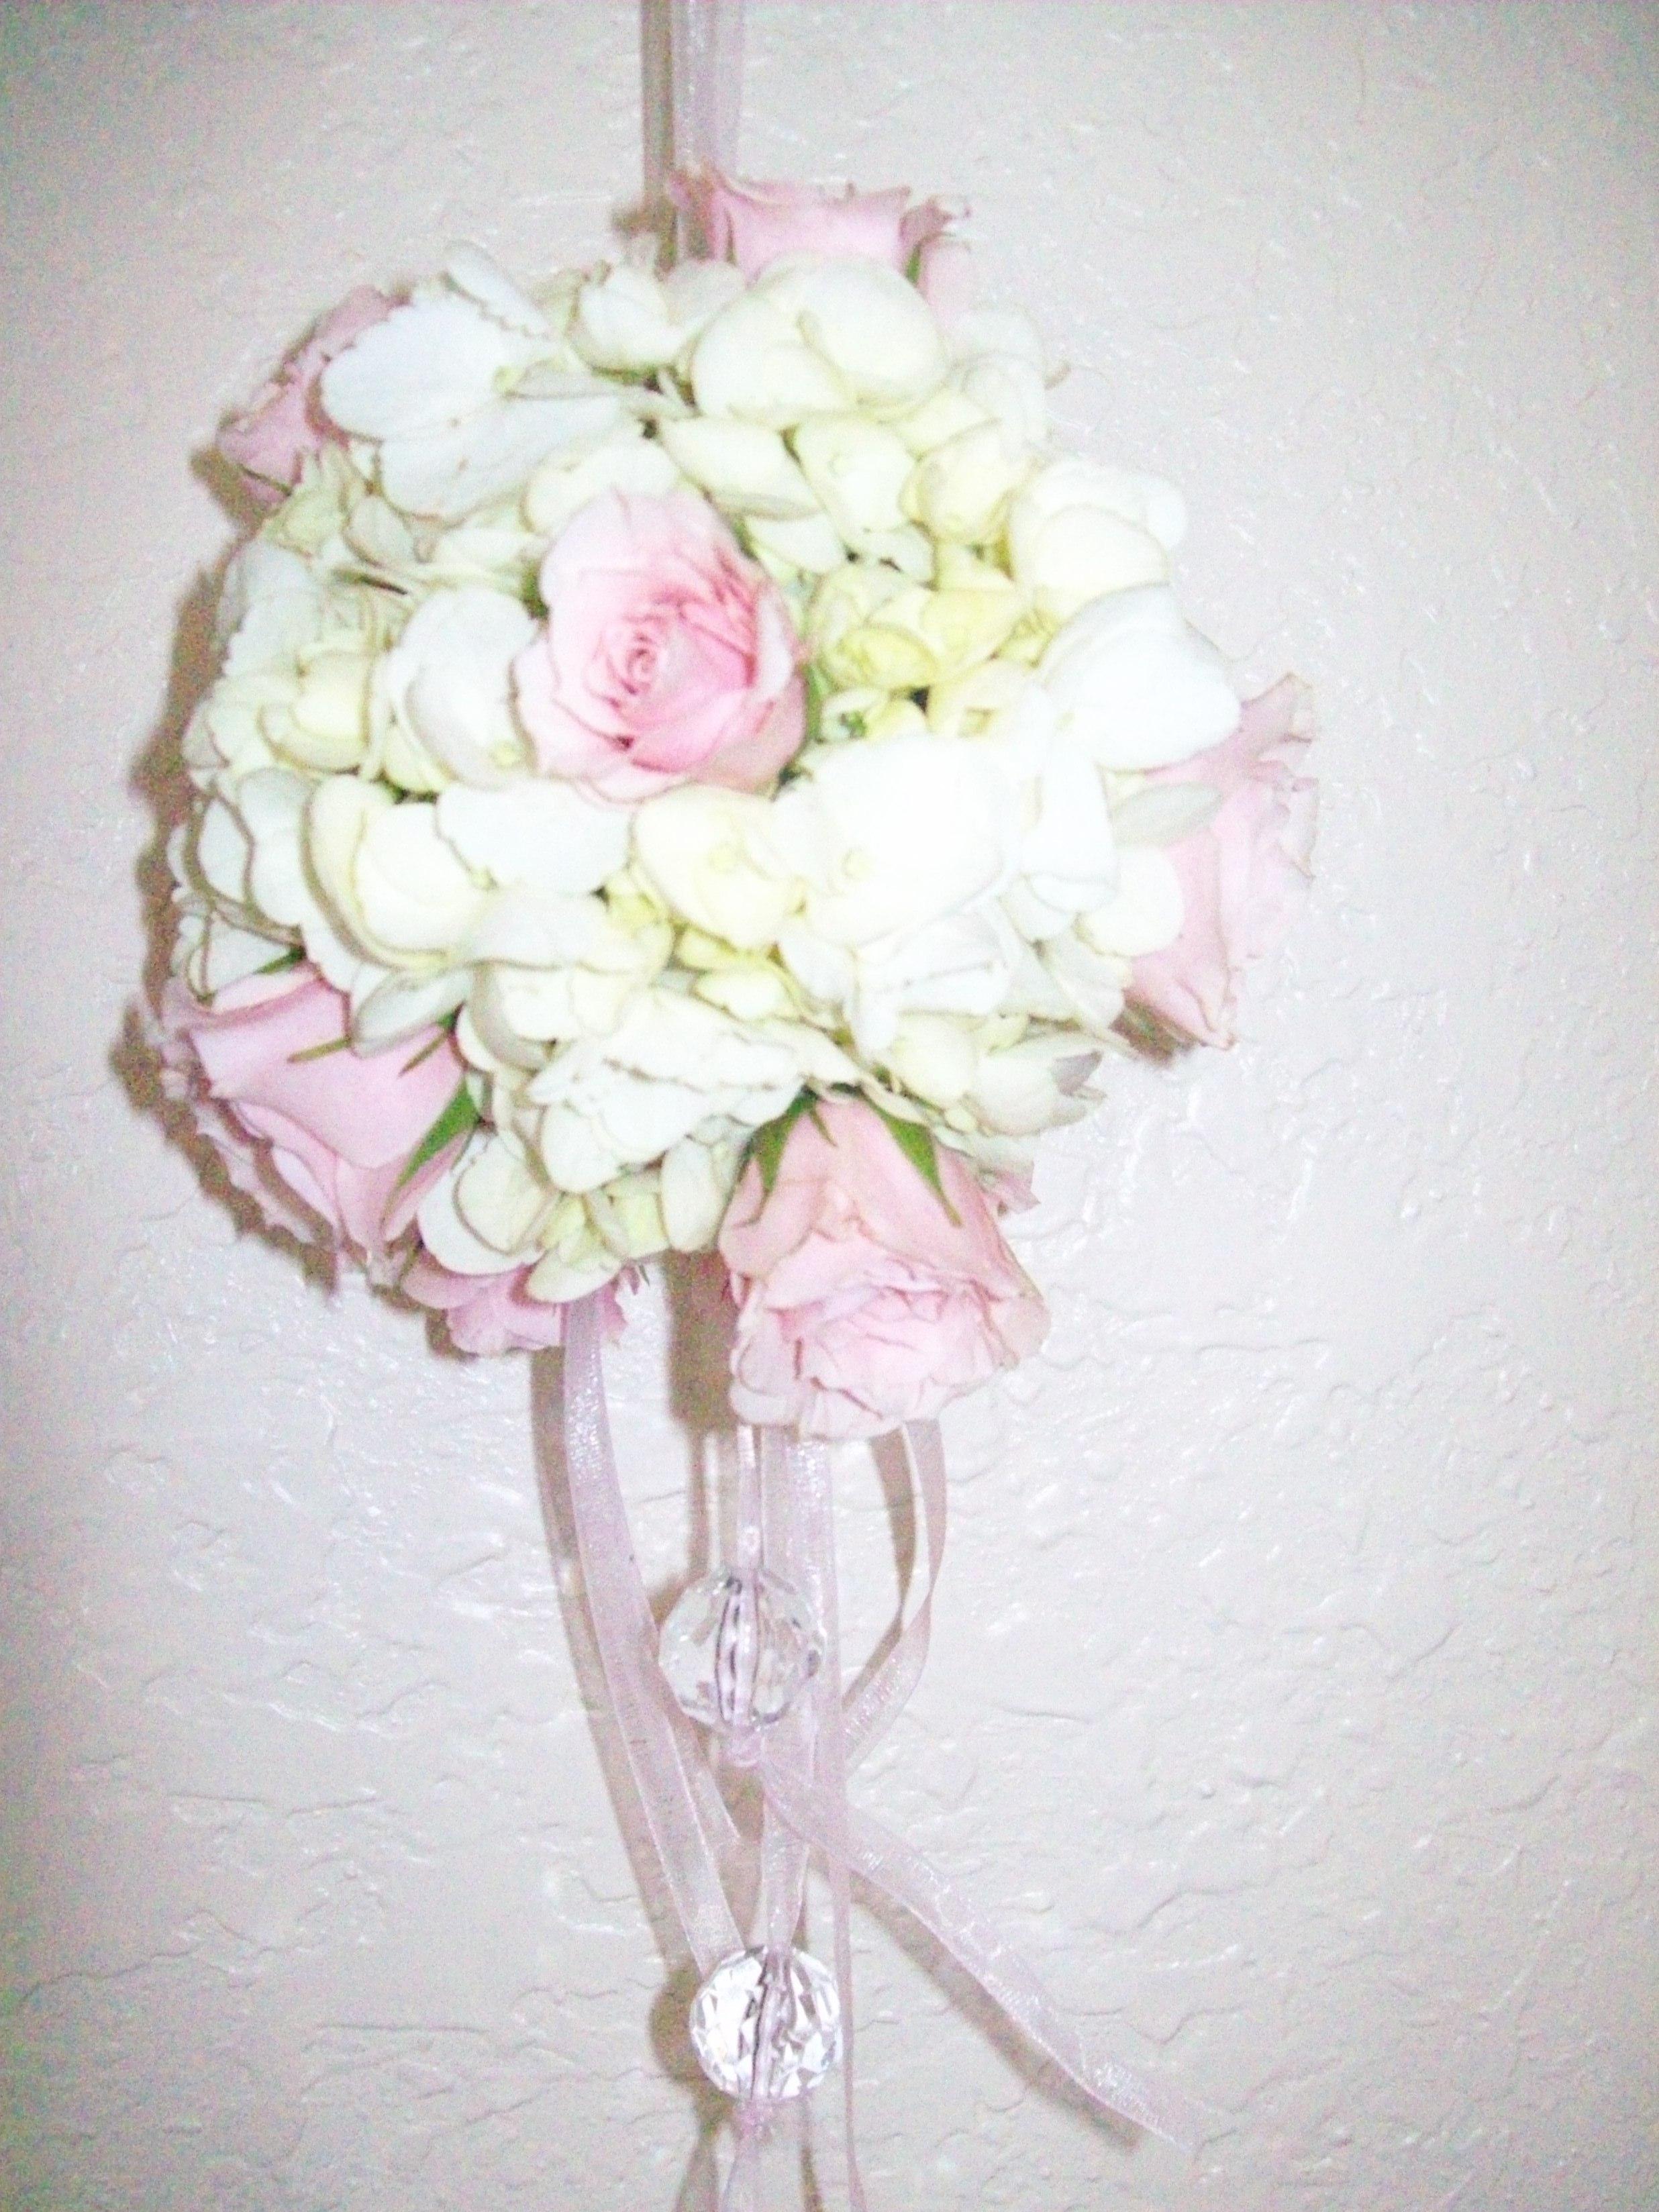 hydrangeas and Pink roses Pomander Ball